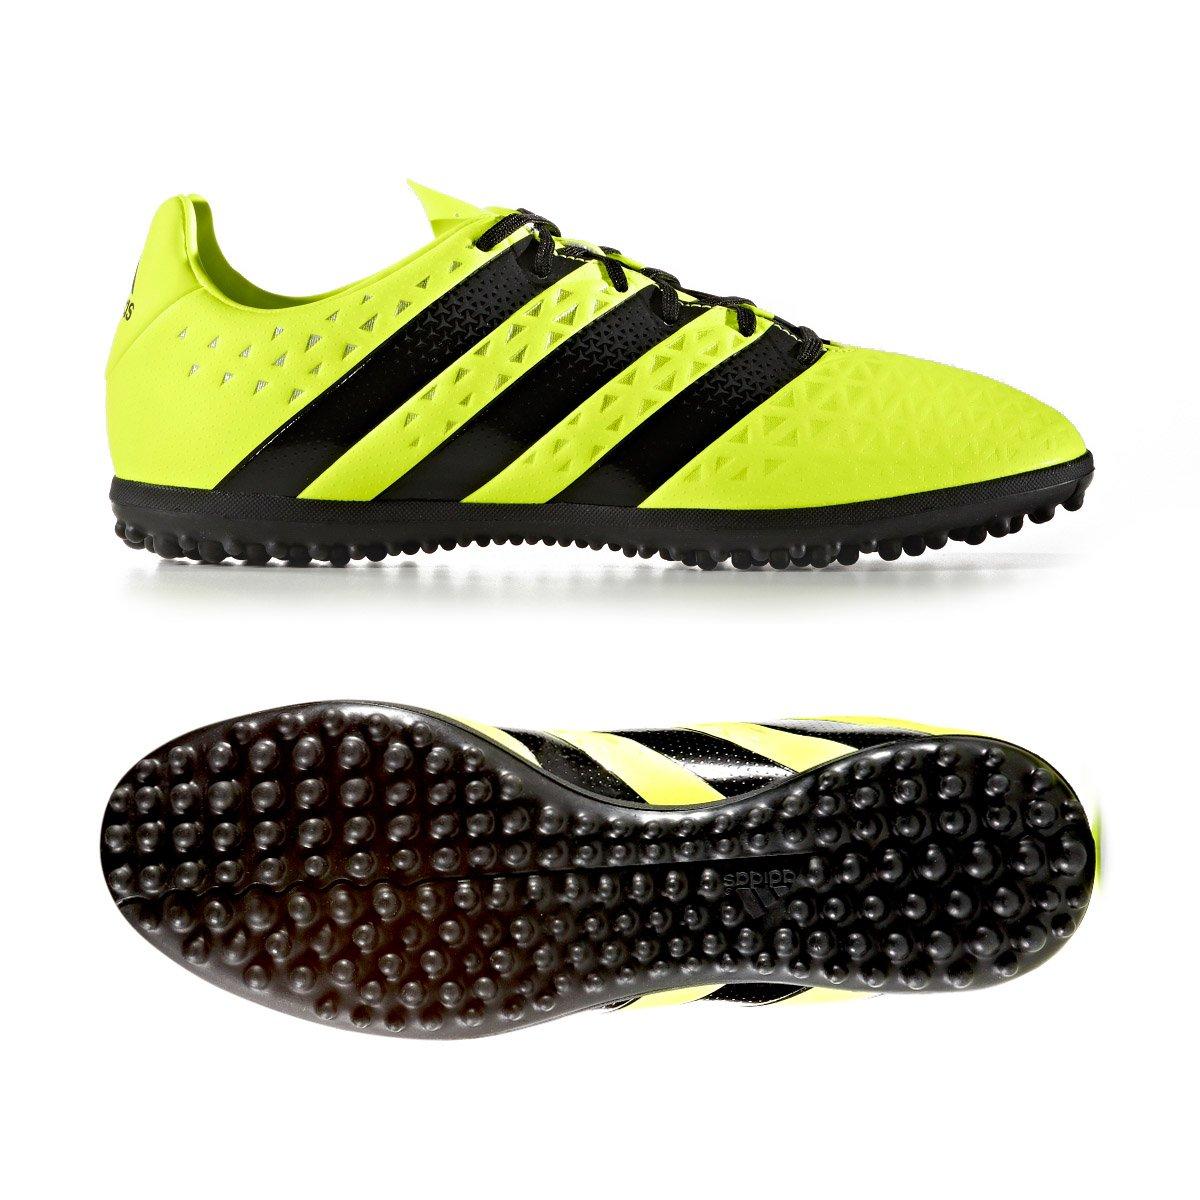 Adidas Ace 16.3 Turf